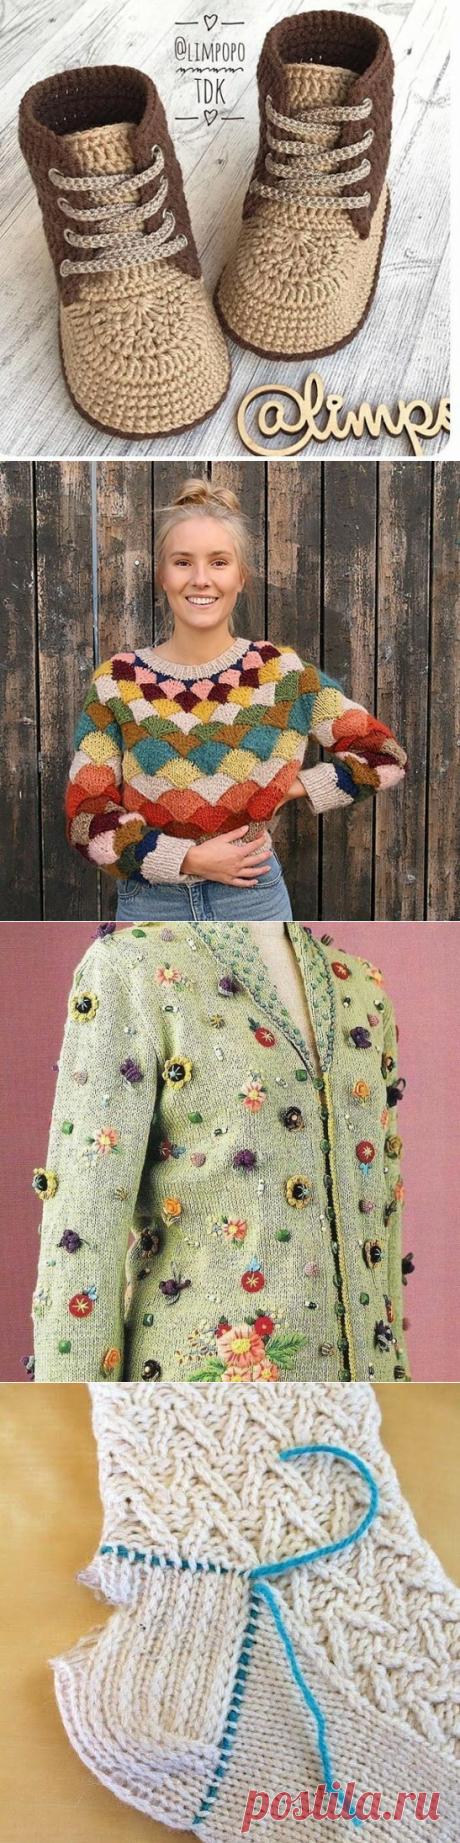 🌷Вязаное вдохновение!🌷 (@world_of_knitted_ideas) • Фото и видео в Instagram